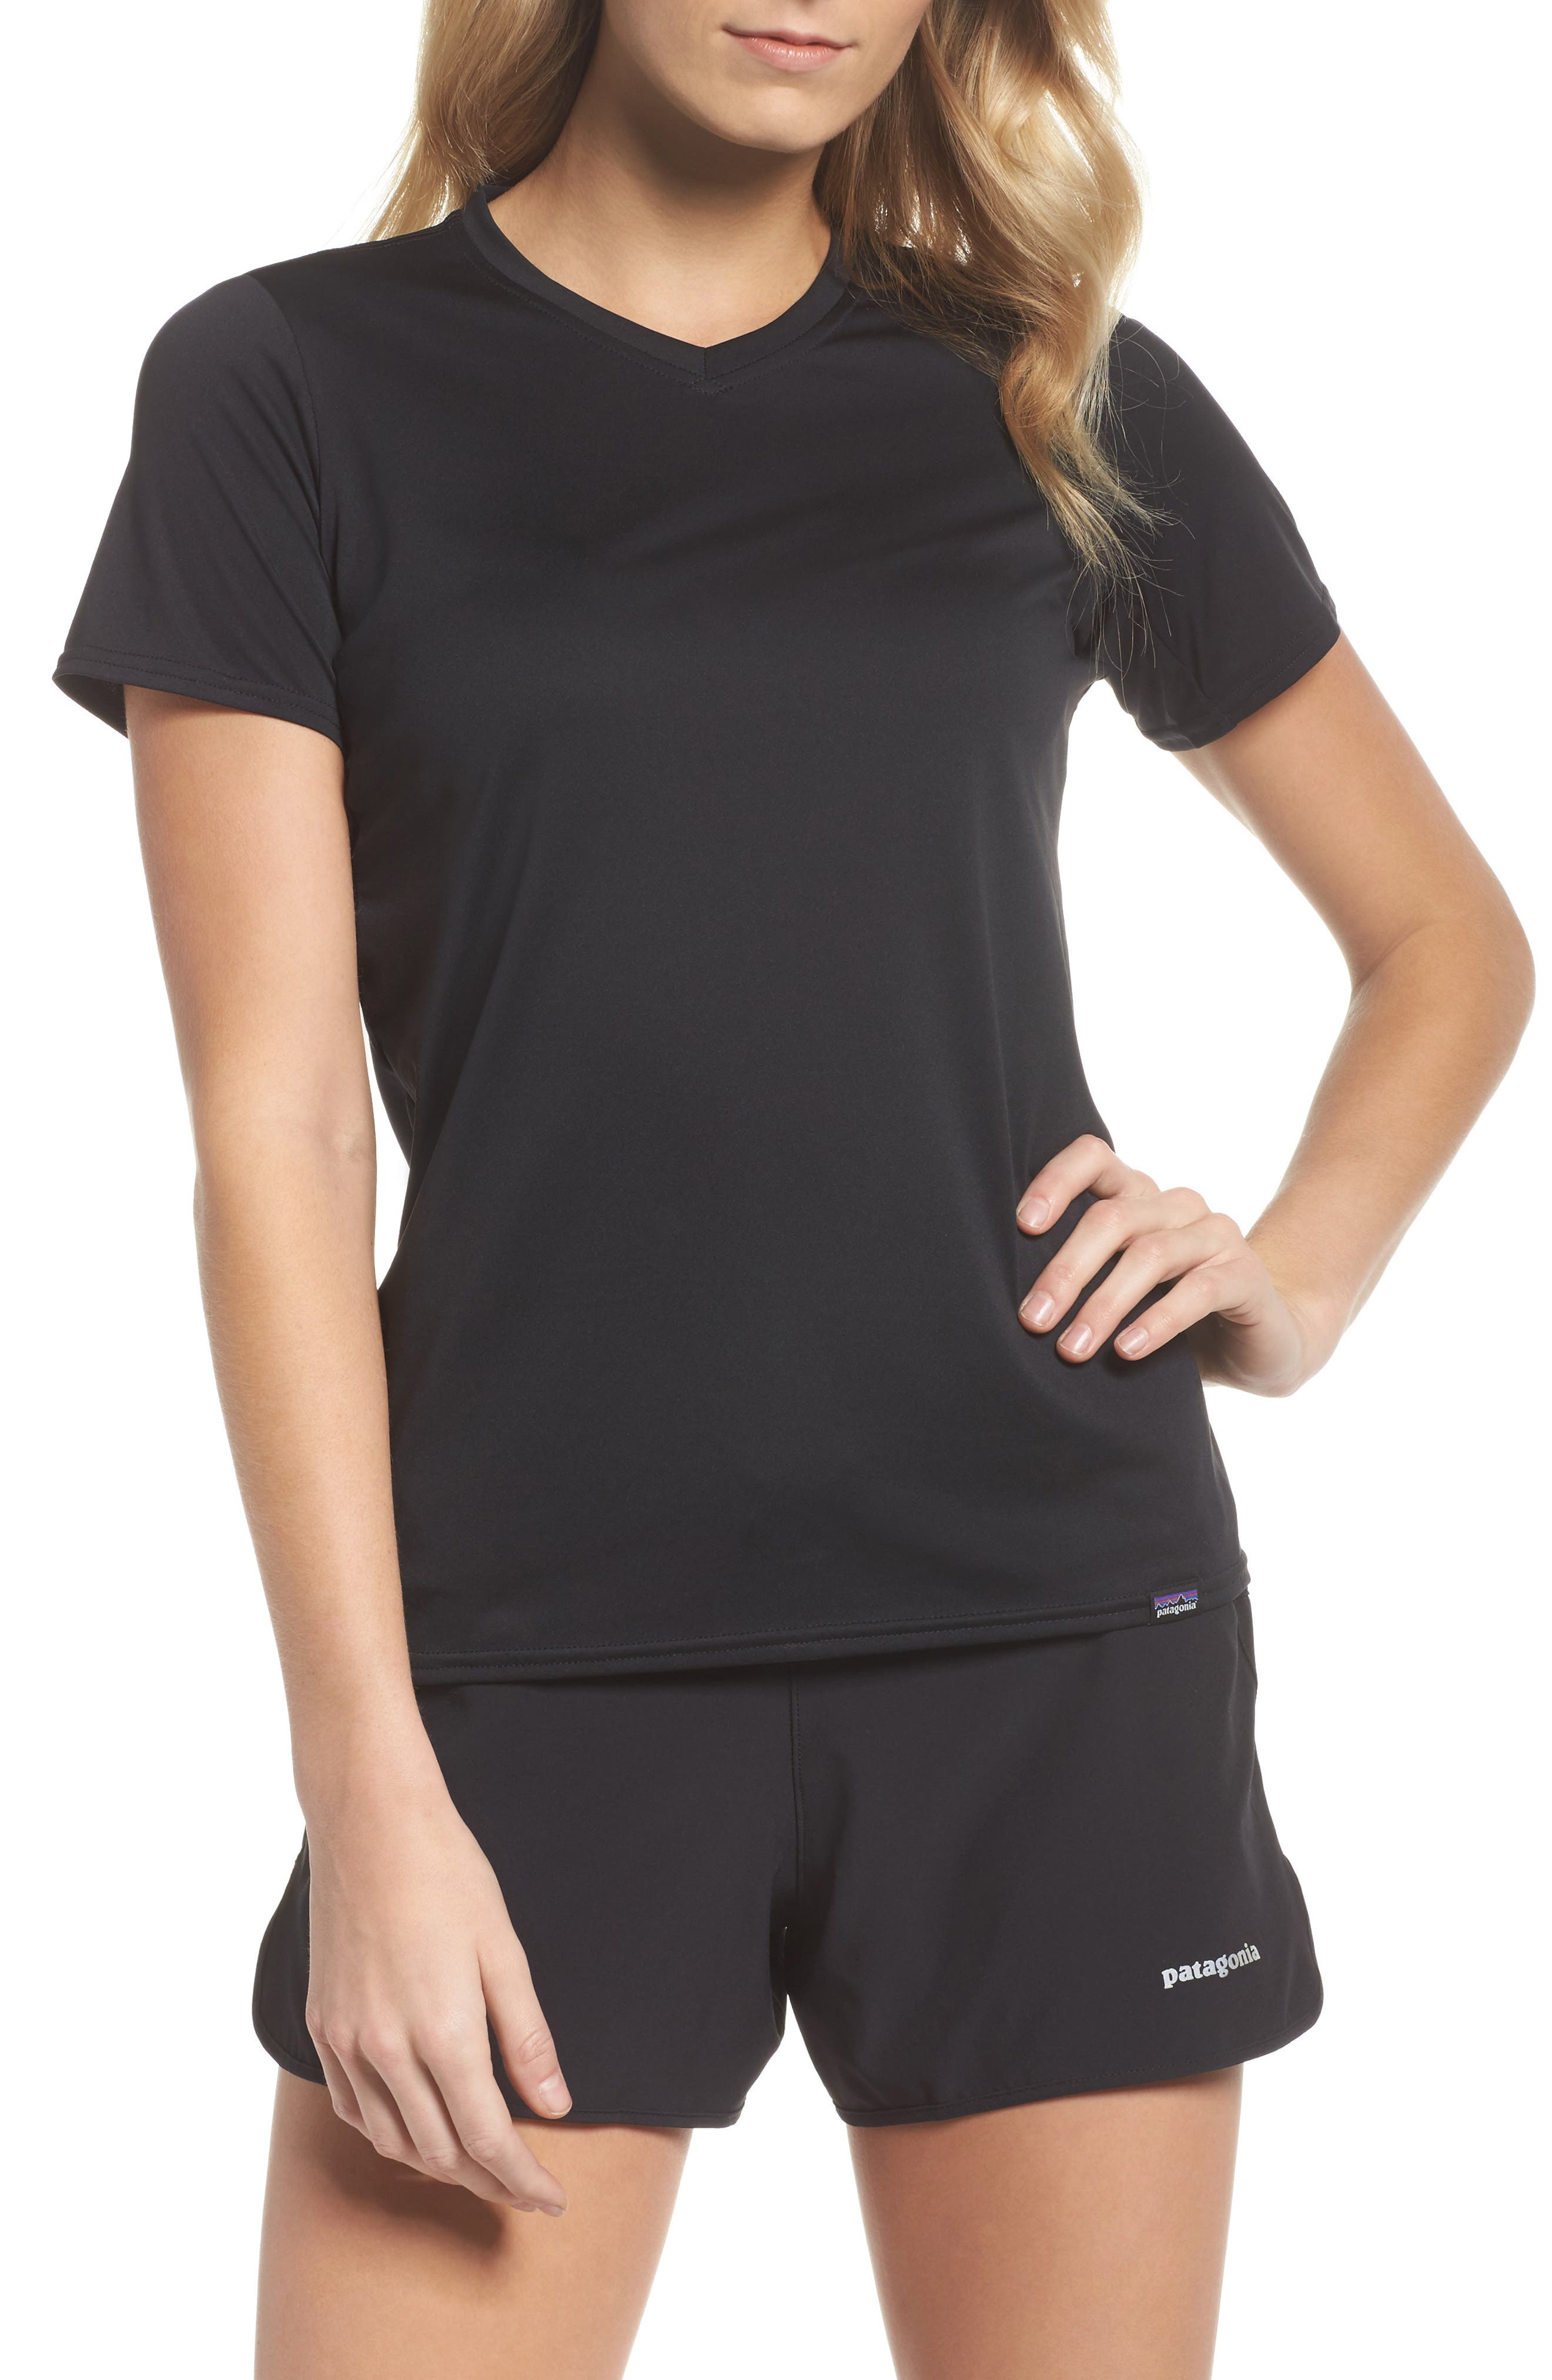 Capilene<sup>®</sup> Dailty T-Shirt,                         Main,                         color, 001